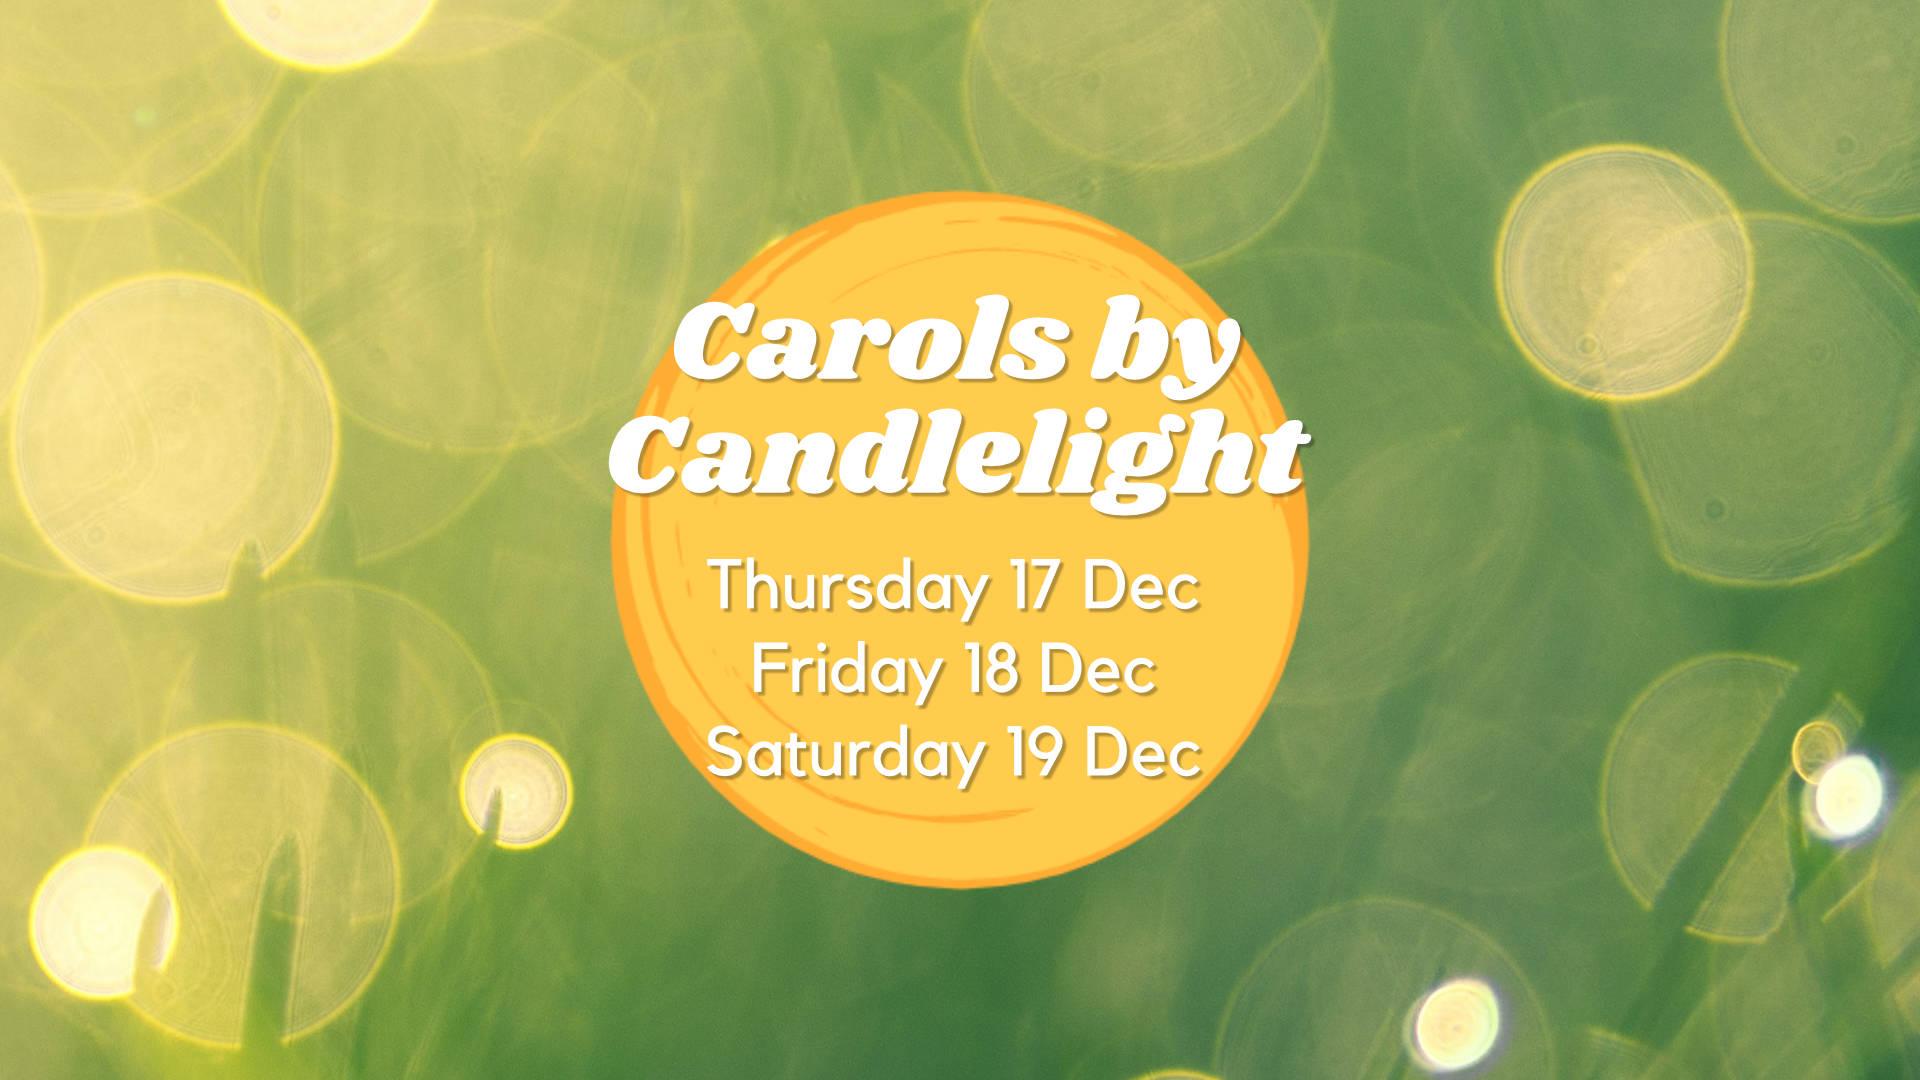 Carols by Candlelight Thursday 17 Dec Friday 18 Dec Saturday 19 Dec